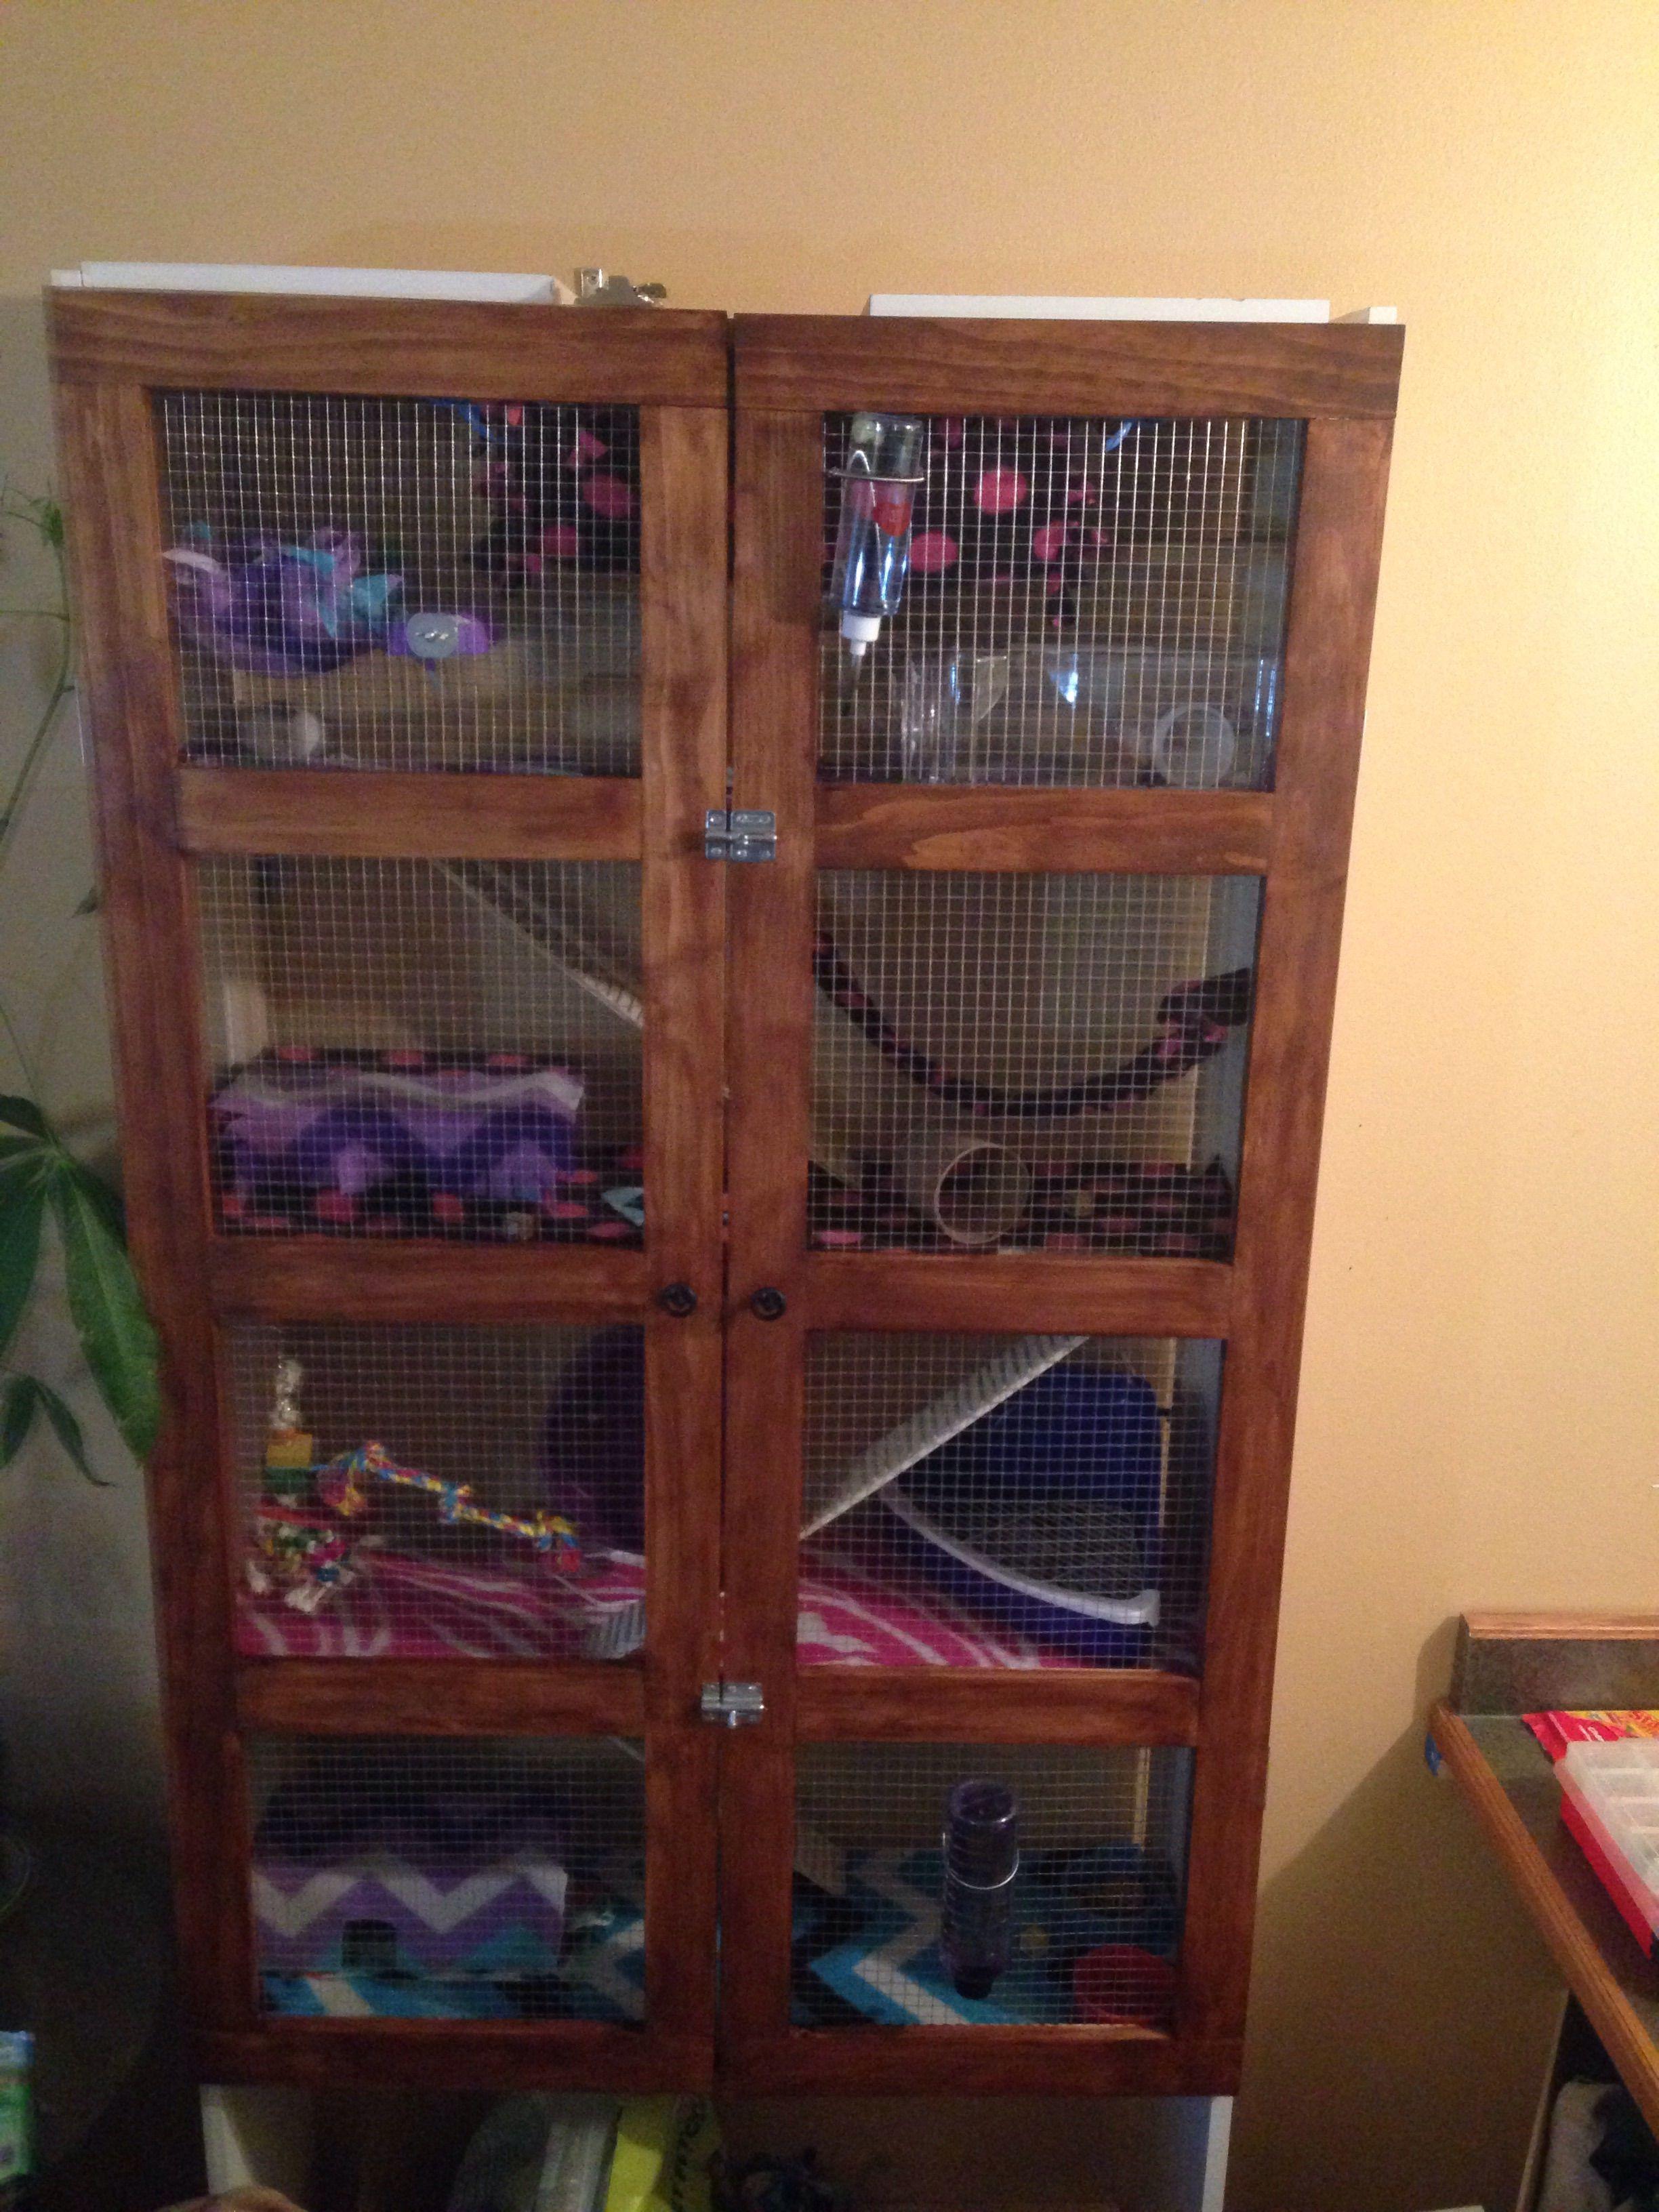 4 Story Bookshelf Rat Cage Bookcase Bookshelves Furnitures